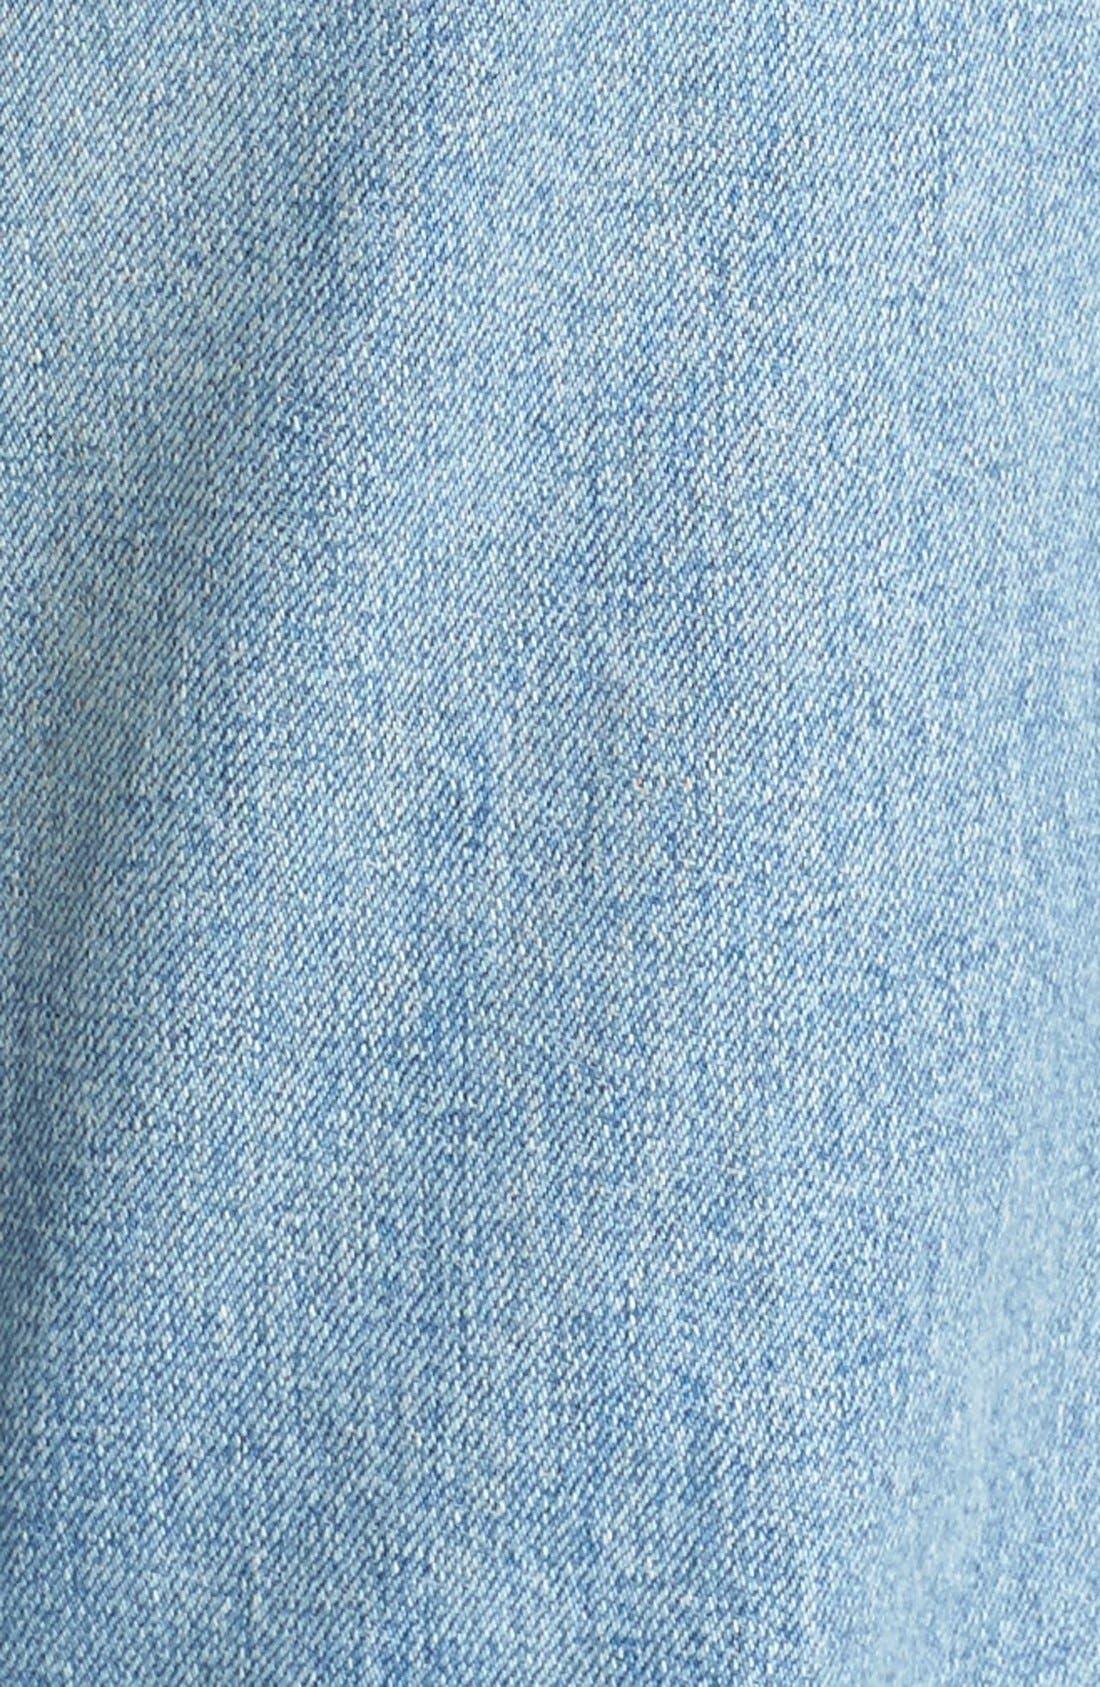 Originals High Waist Straight Skinny Stretch Jeans,                             Alternate thumbnail 5, color,                             Light